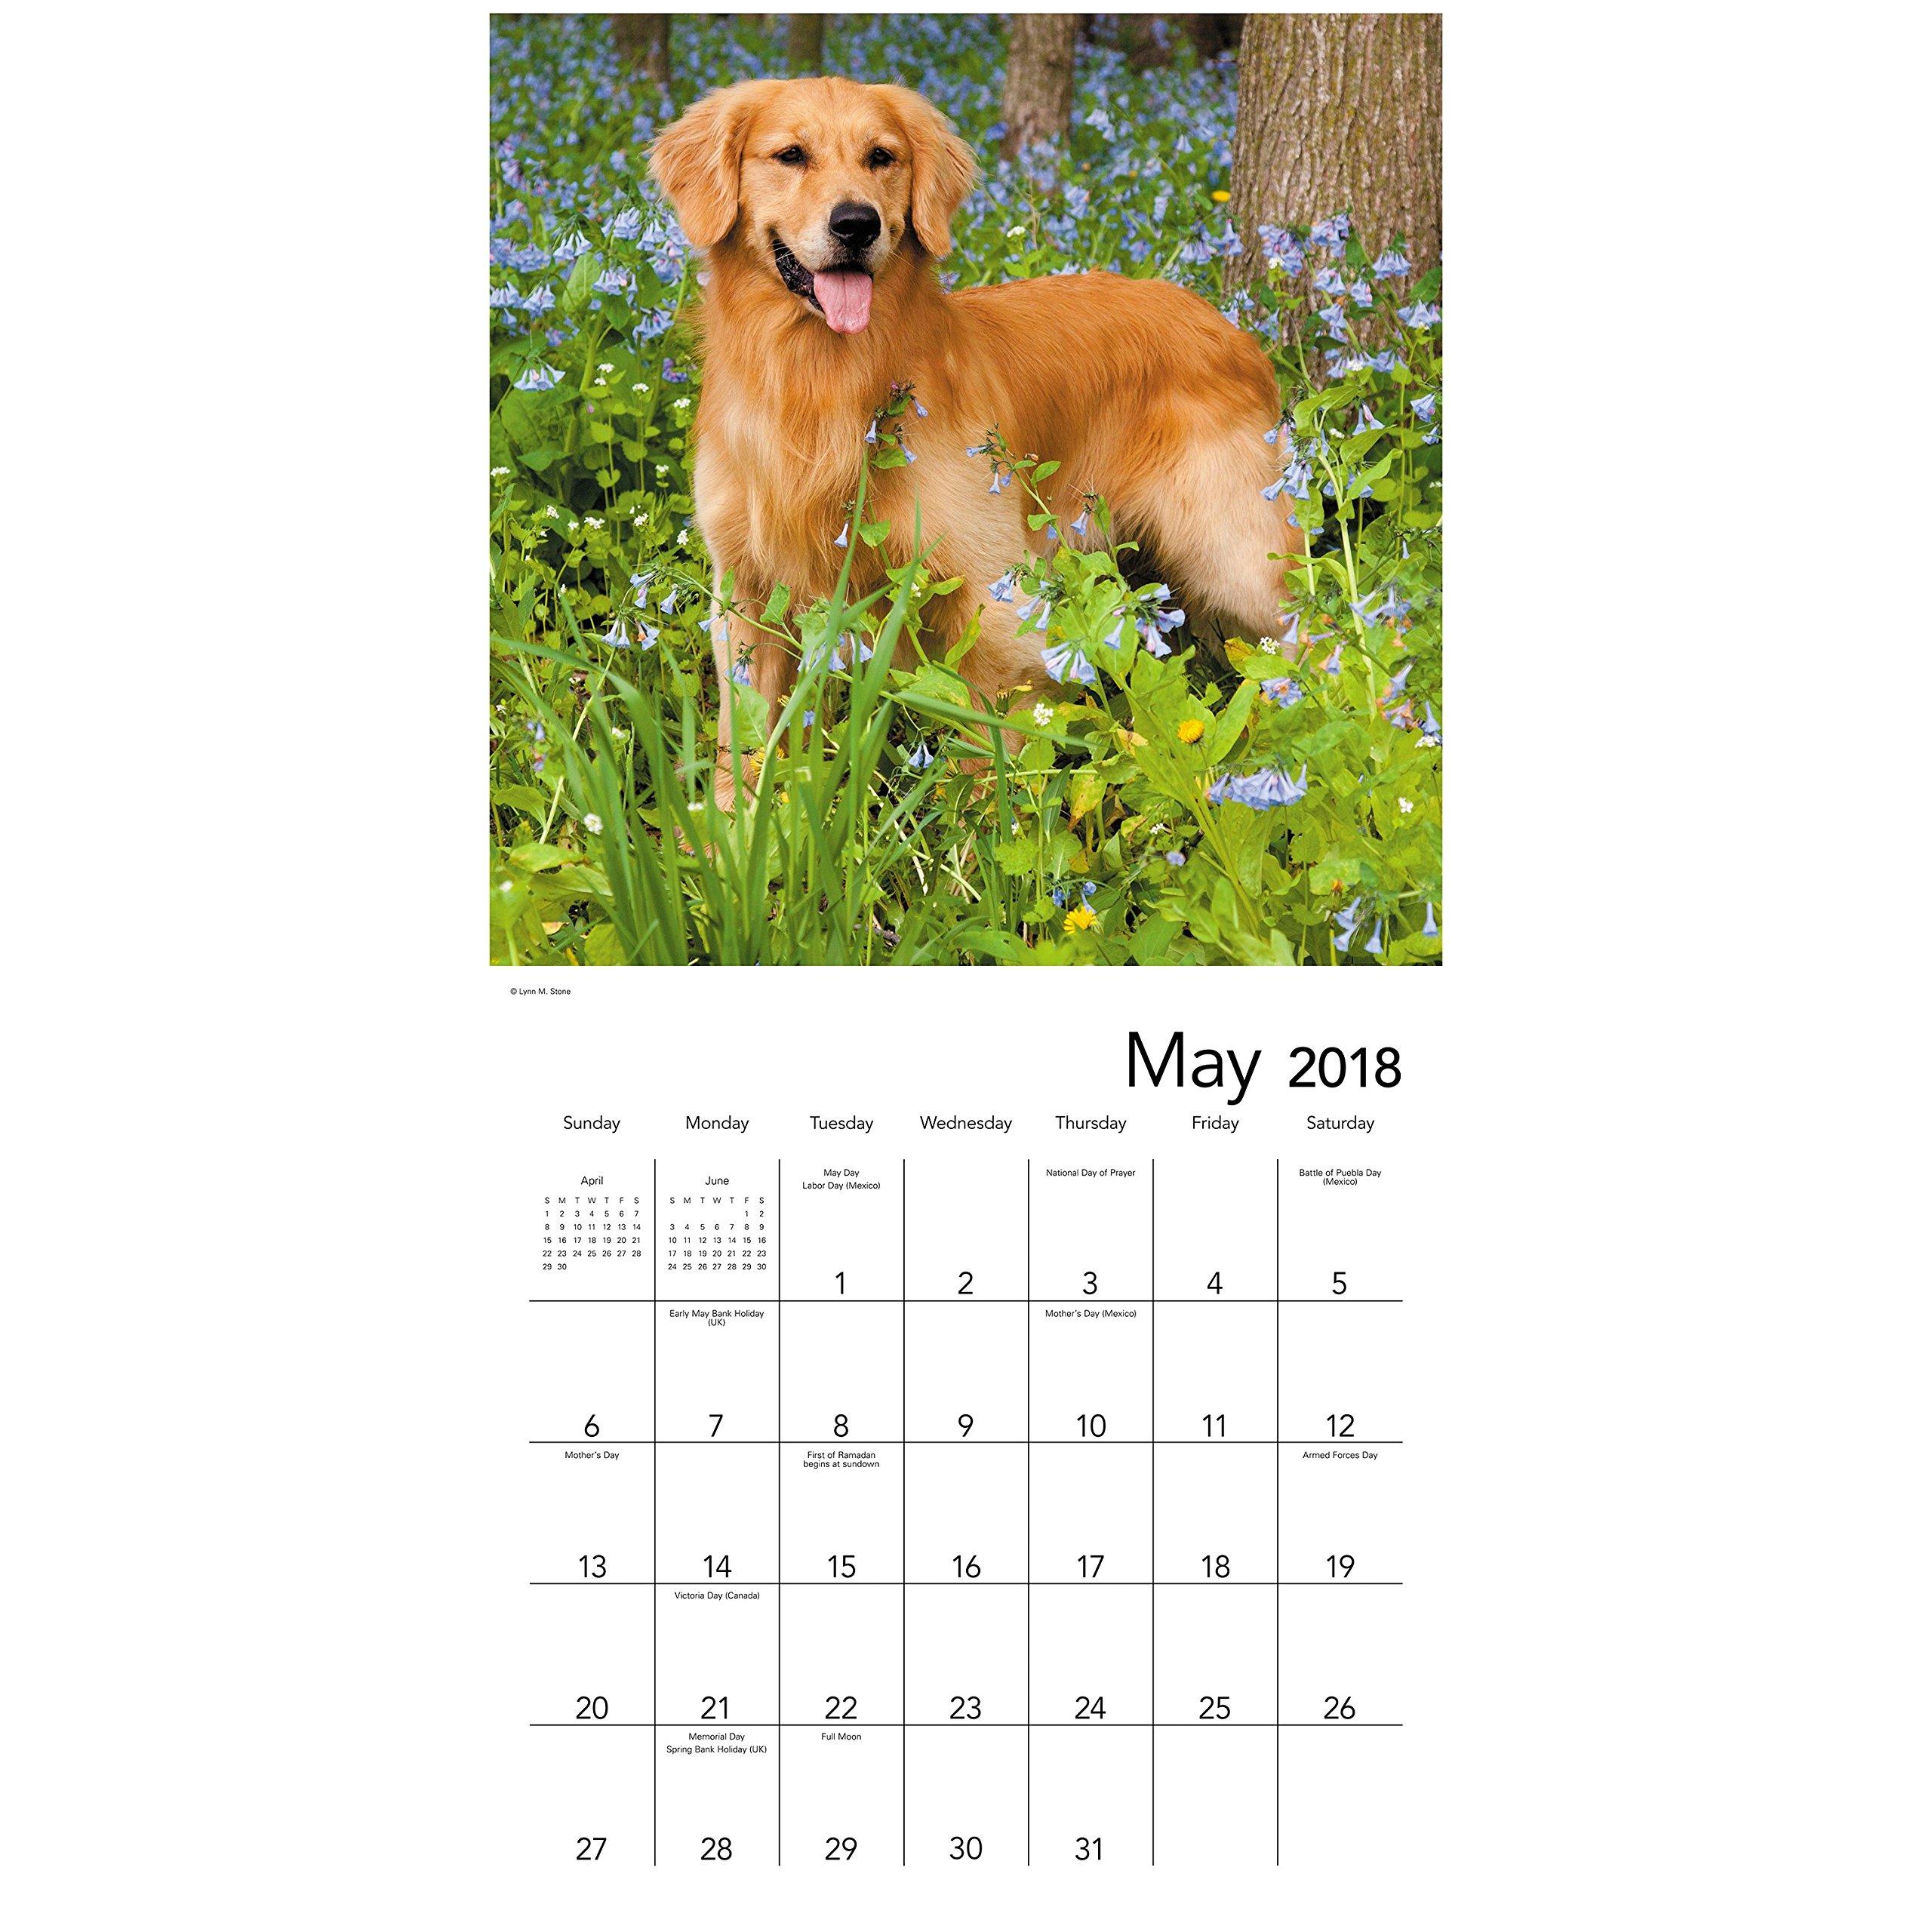 2018 golden retrievers wall calendar mead mead 0038576721883 2018 golden retrievers wall calendar mead mead 0038576721883 amazon books nvjuhfo Choice Image